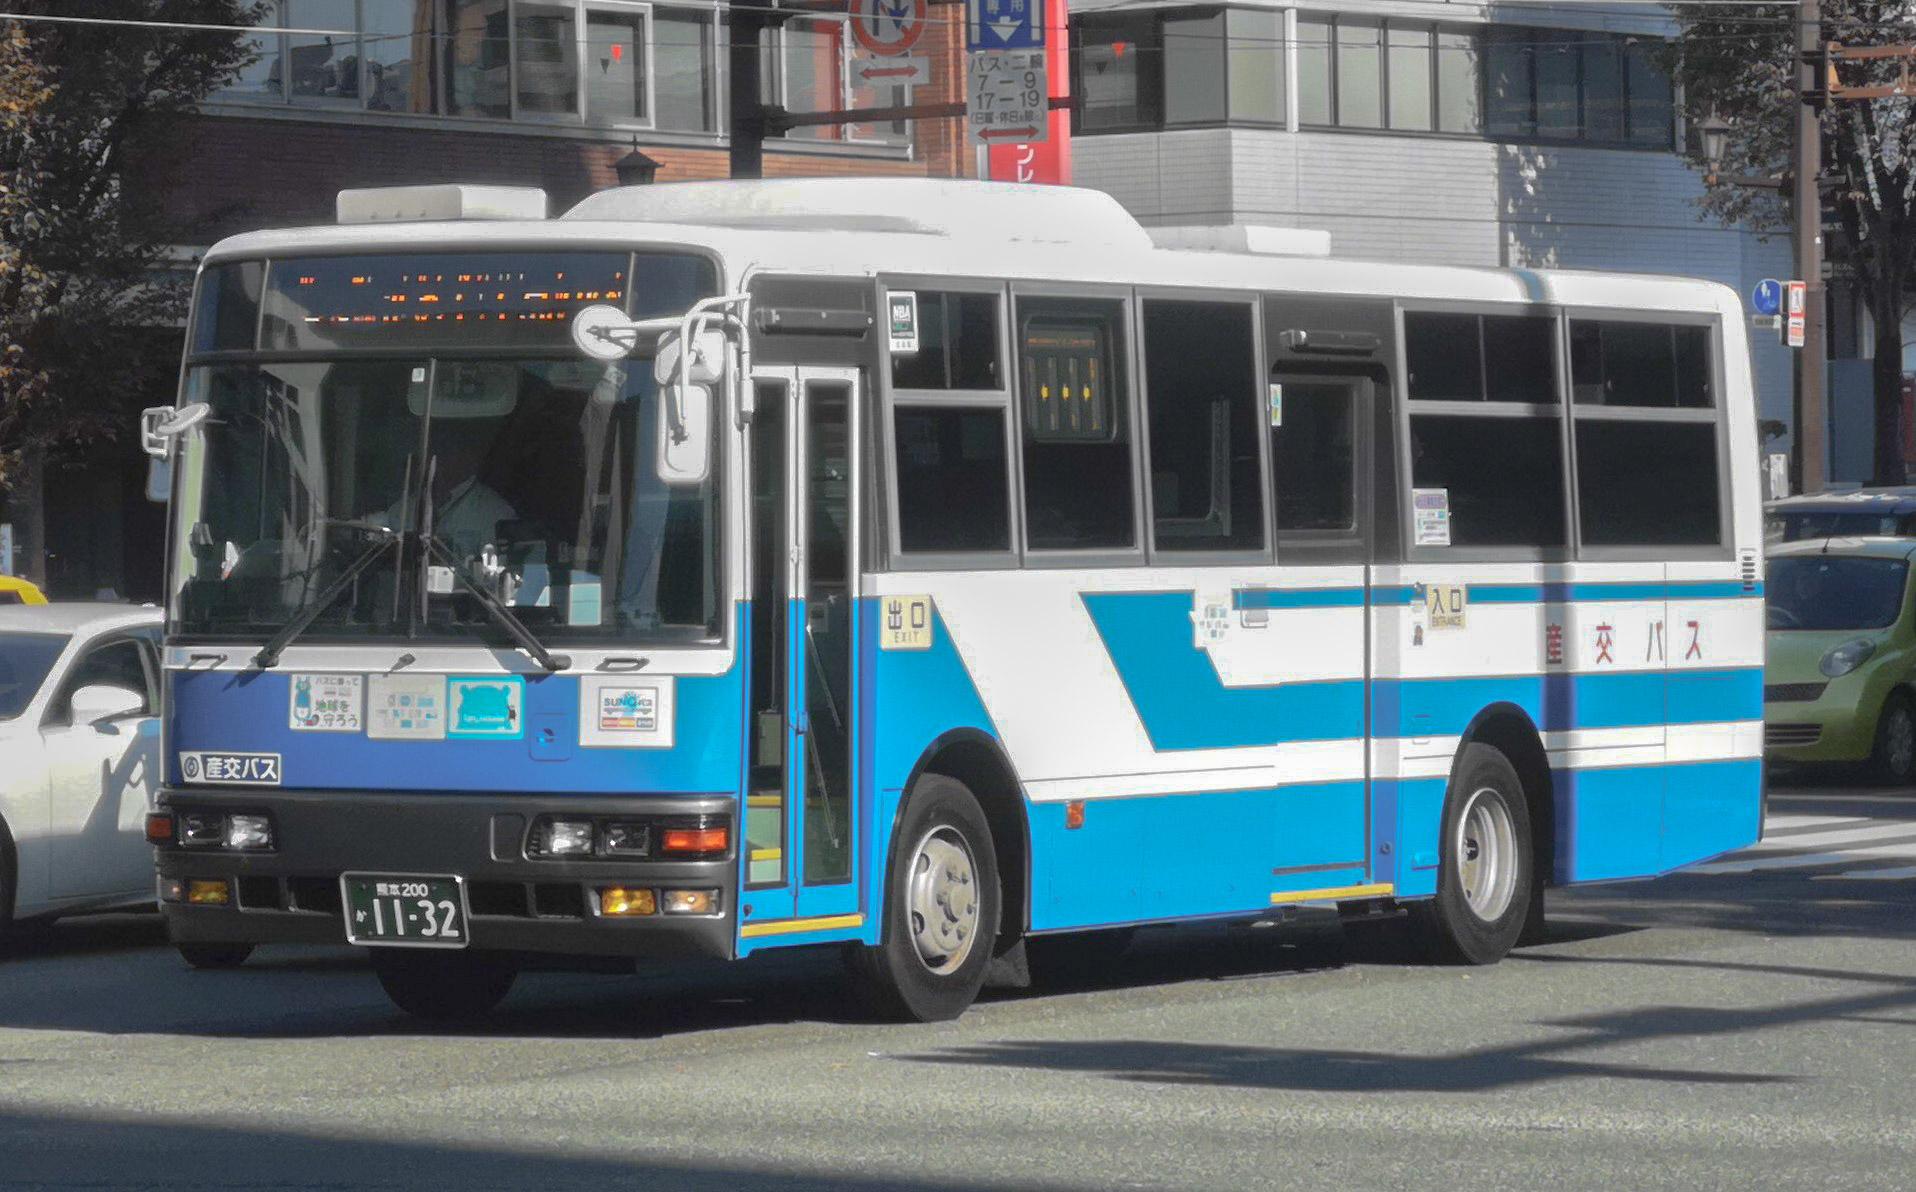 🚌BUS画像館熊本🚏ASOエクスプレス号(福岡ー阿蘇線)とAso-go(熊本ー阿蘇線)は、10月11日(日)をもって運行休止(利用客低迷により路線維持・継続困難な為)。  産交バス 熊本200か1132コメント                kmbdt926